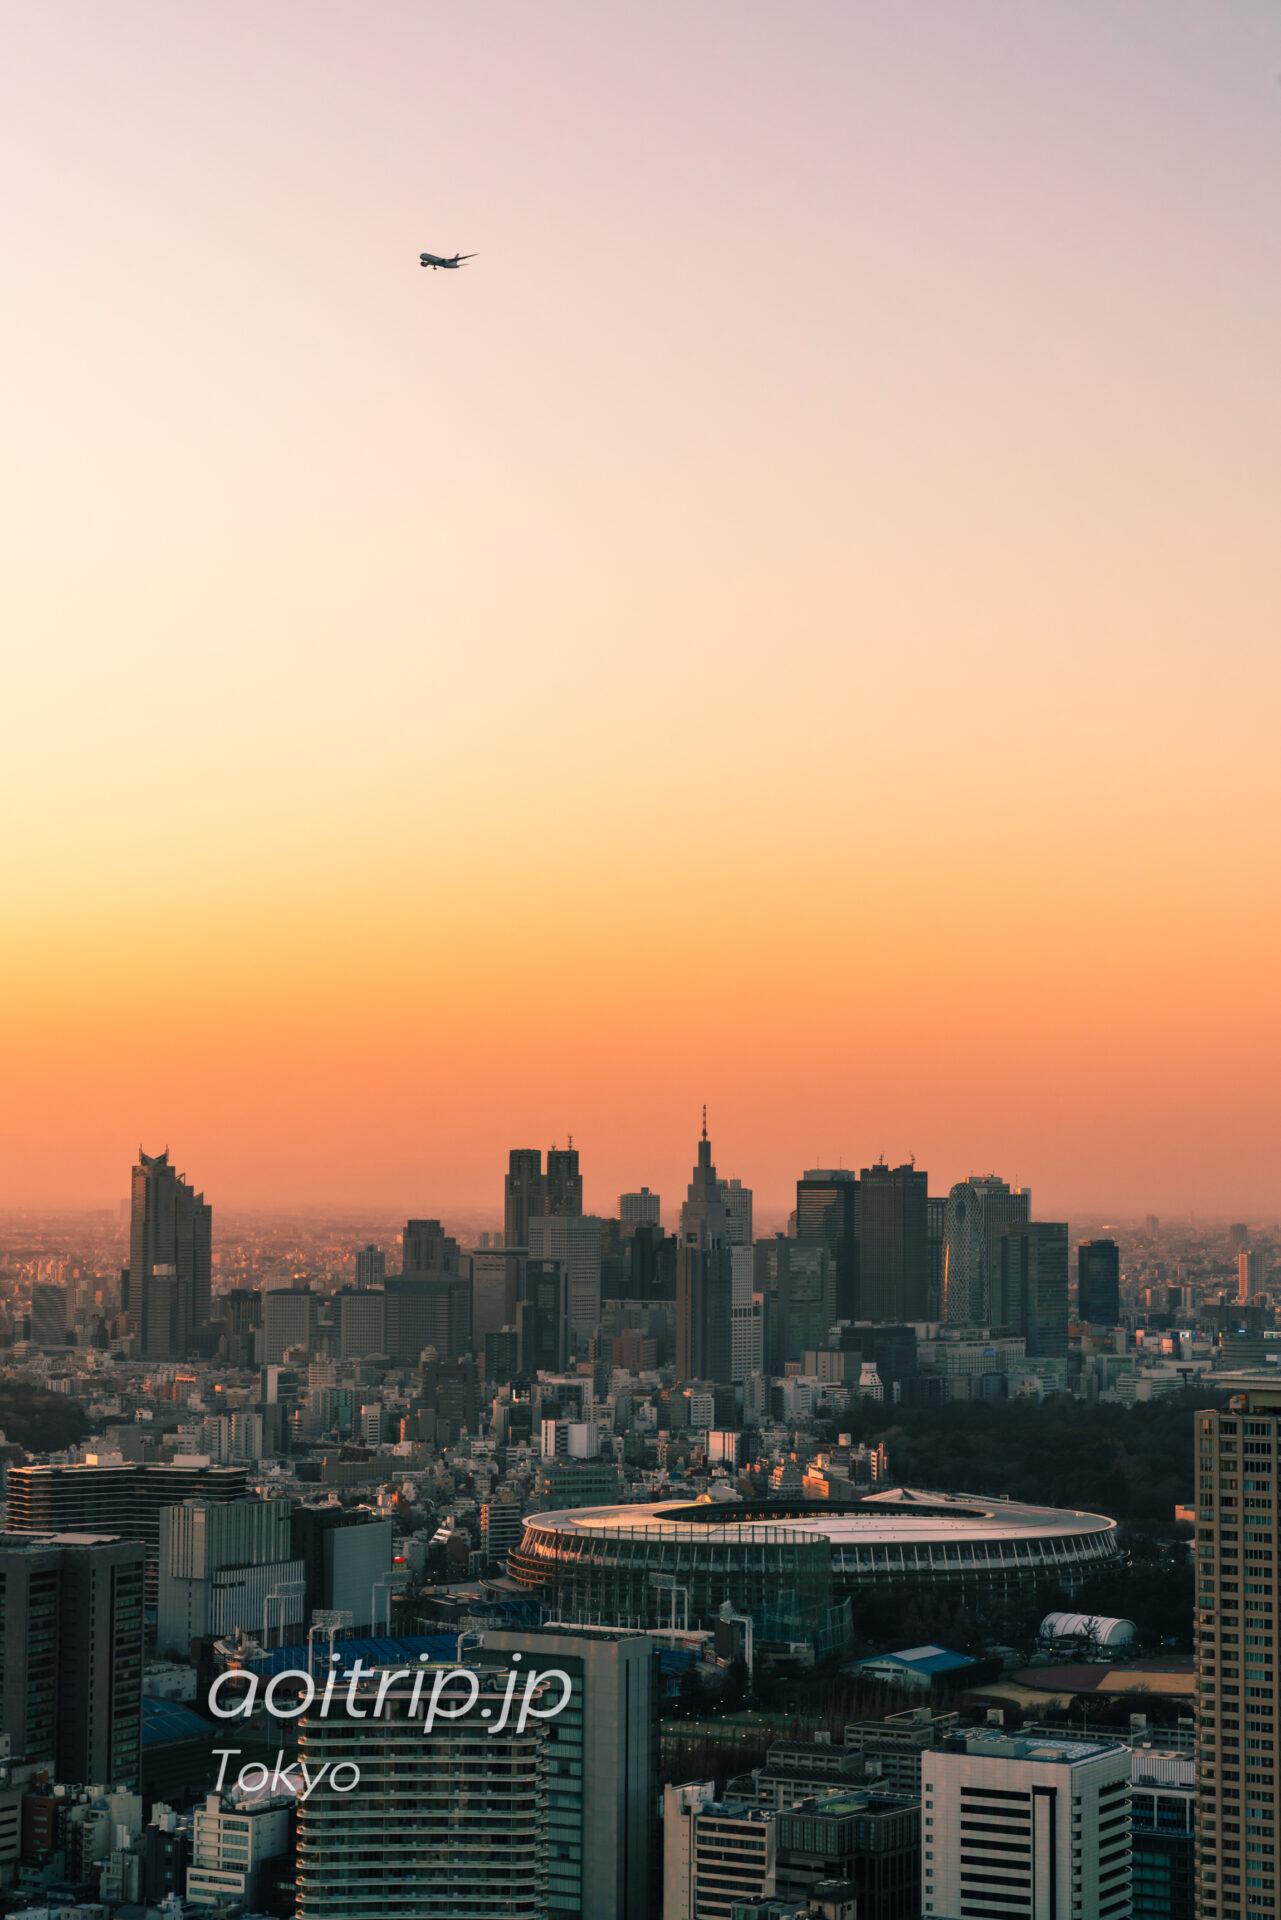 Tokyo Skyline ザ リッツカールトン東京から望む新宿副都心と国立競技場と飛行機